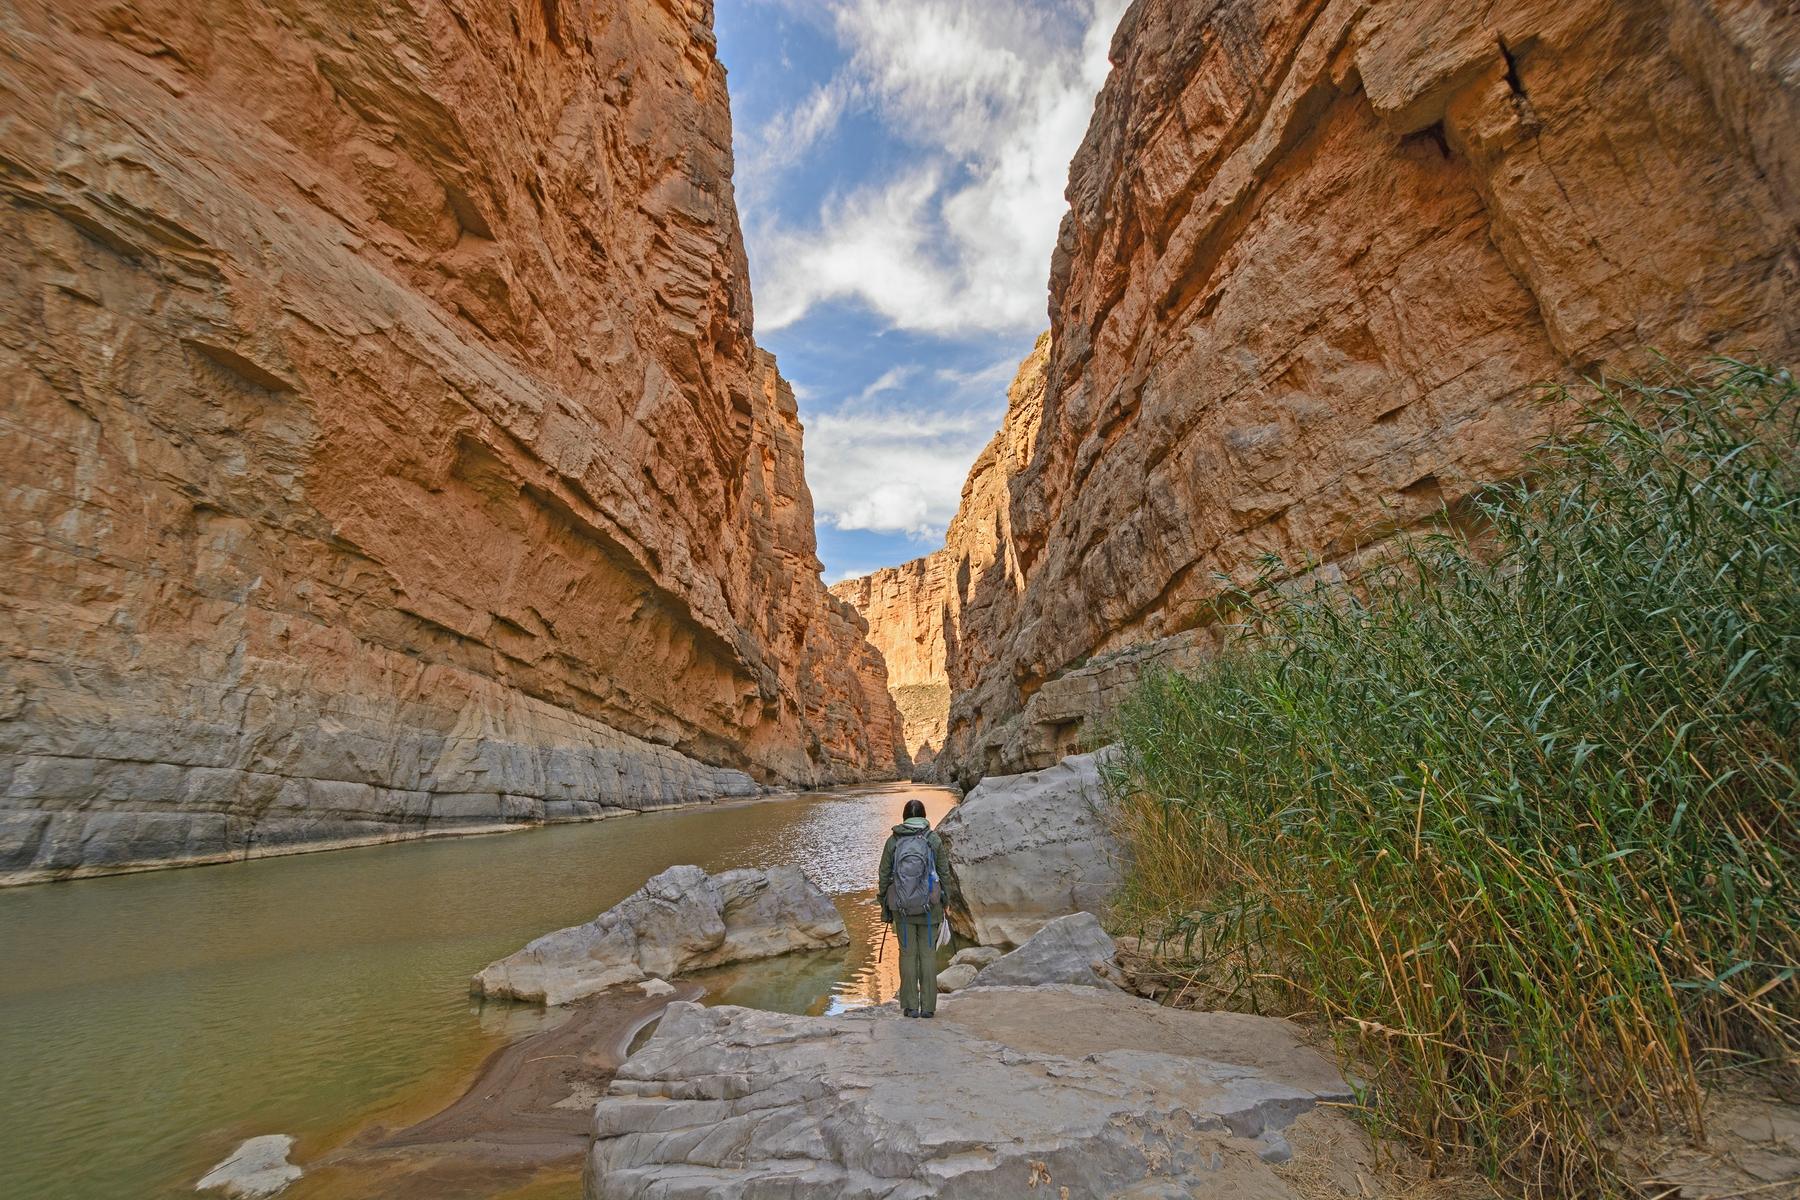 small man inside a river canyon